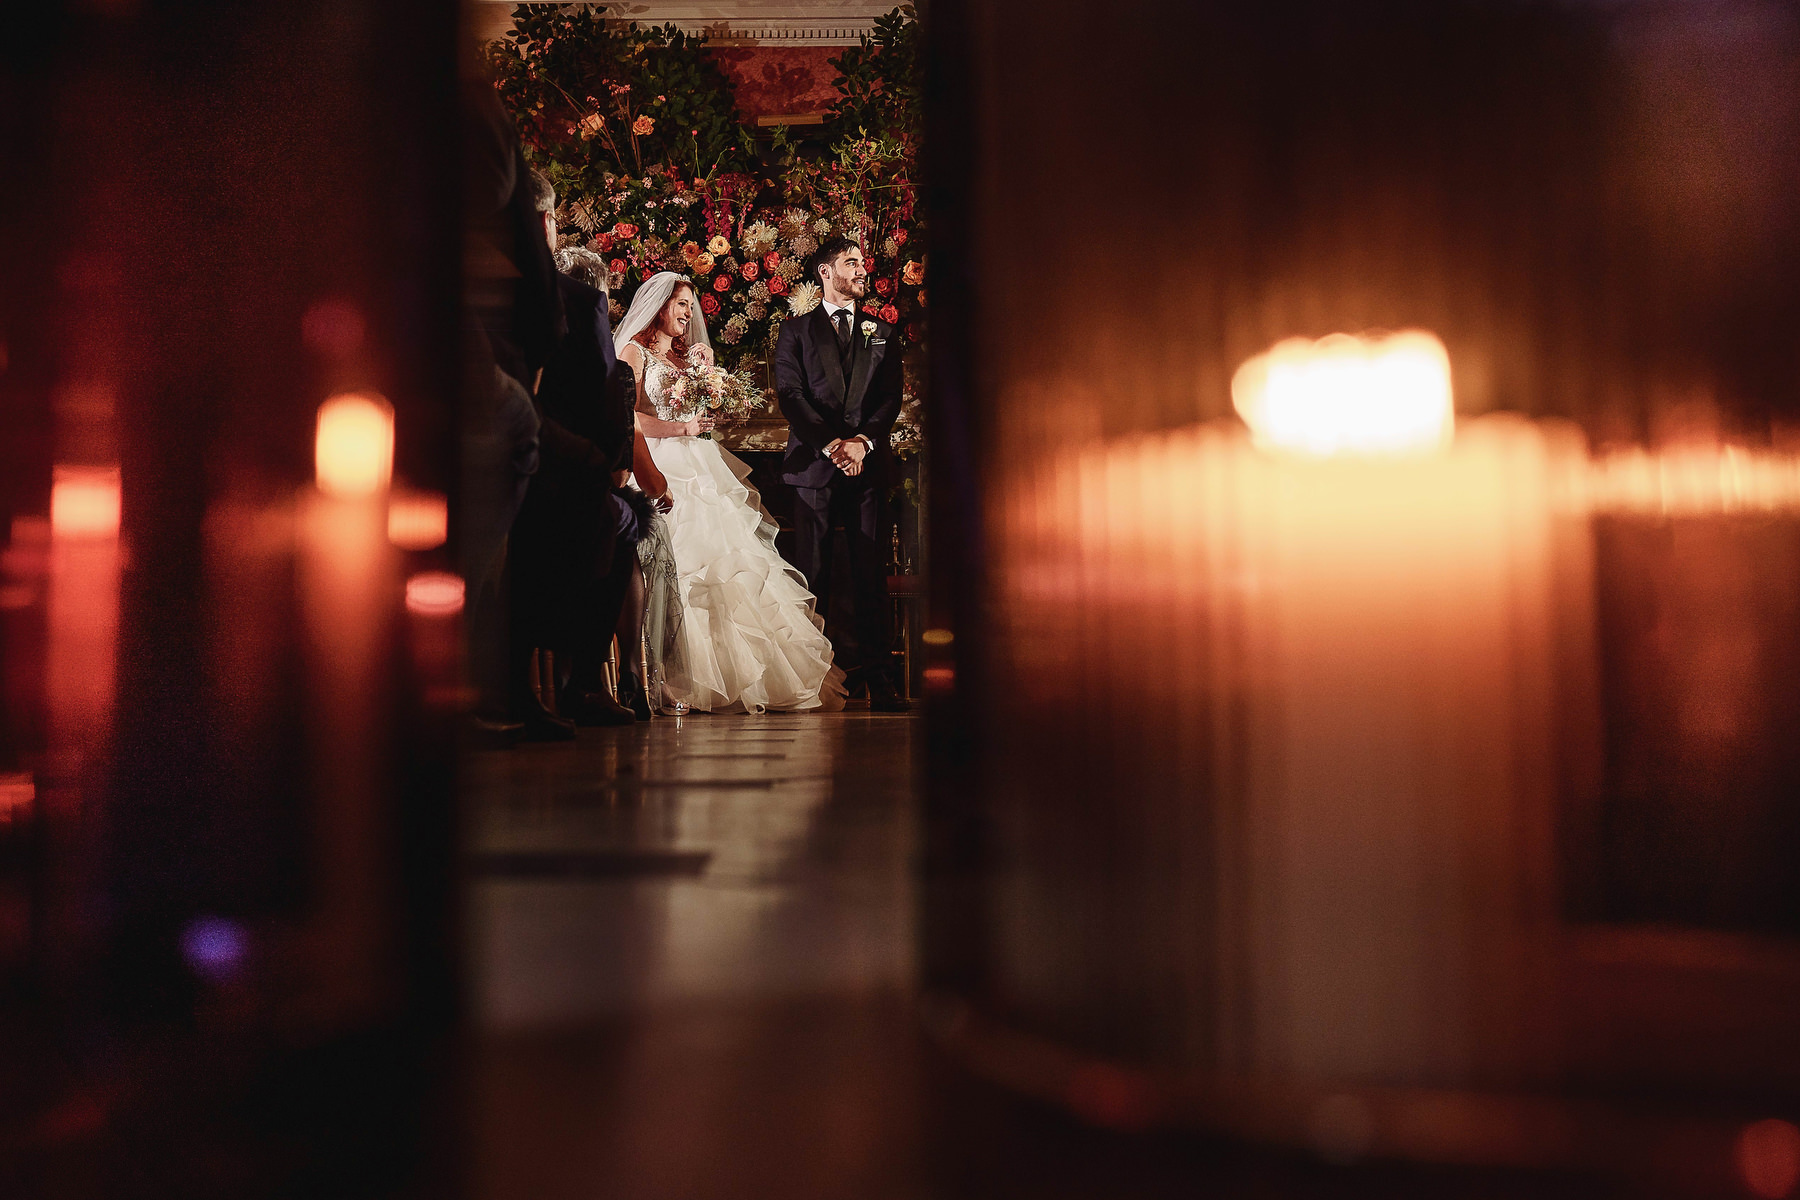 Searcys Wedding Photography ceremony